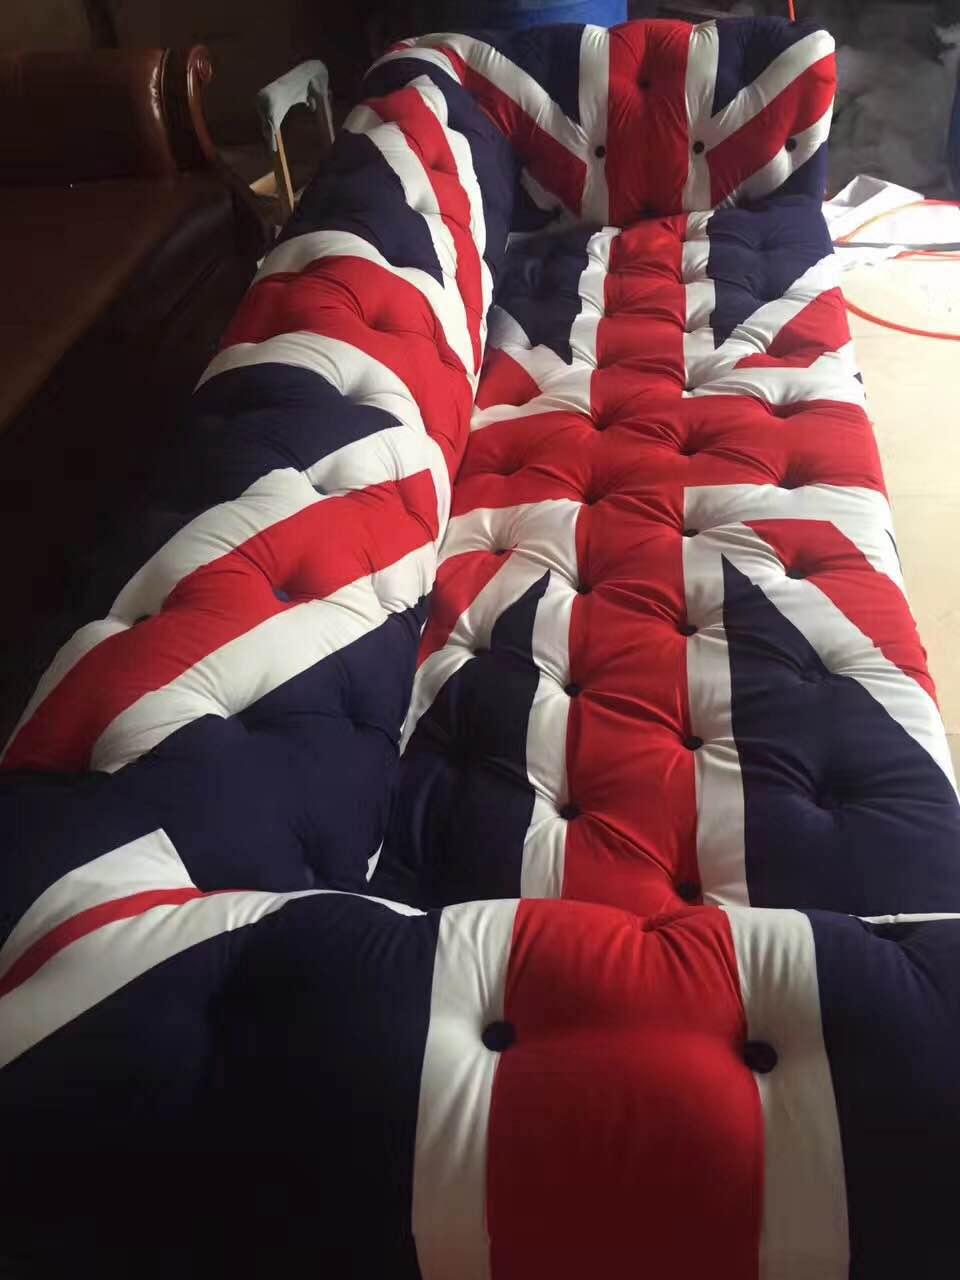 Conjunto de sofá de tela de terciopelo, mobiliario para sala de estar, sofá de tela de terciopelo, sofá seccional para sala de estar, sofá esquinero con 3 plazas en stock